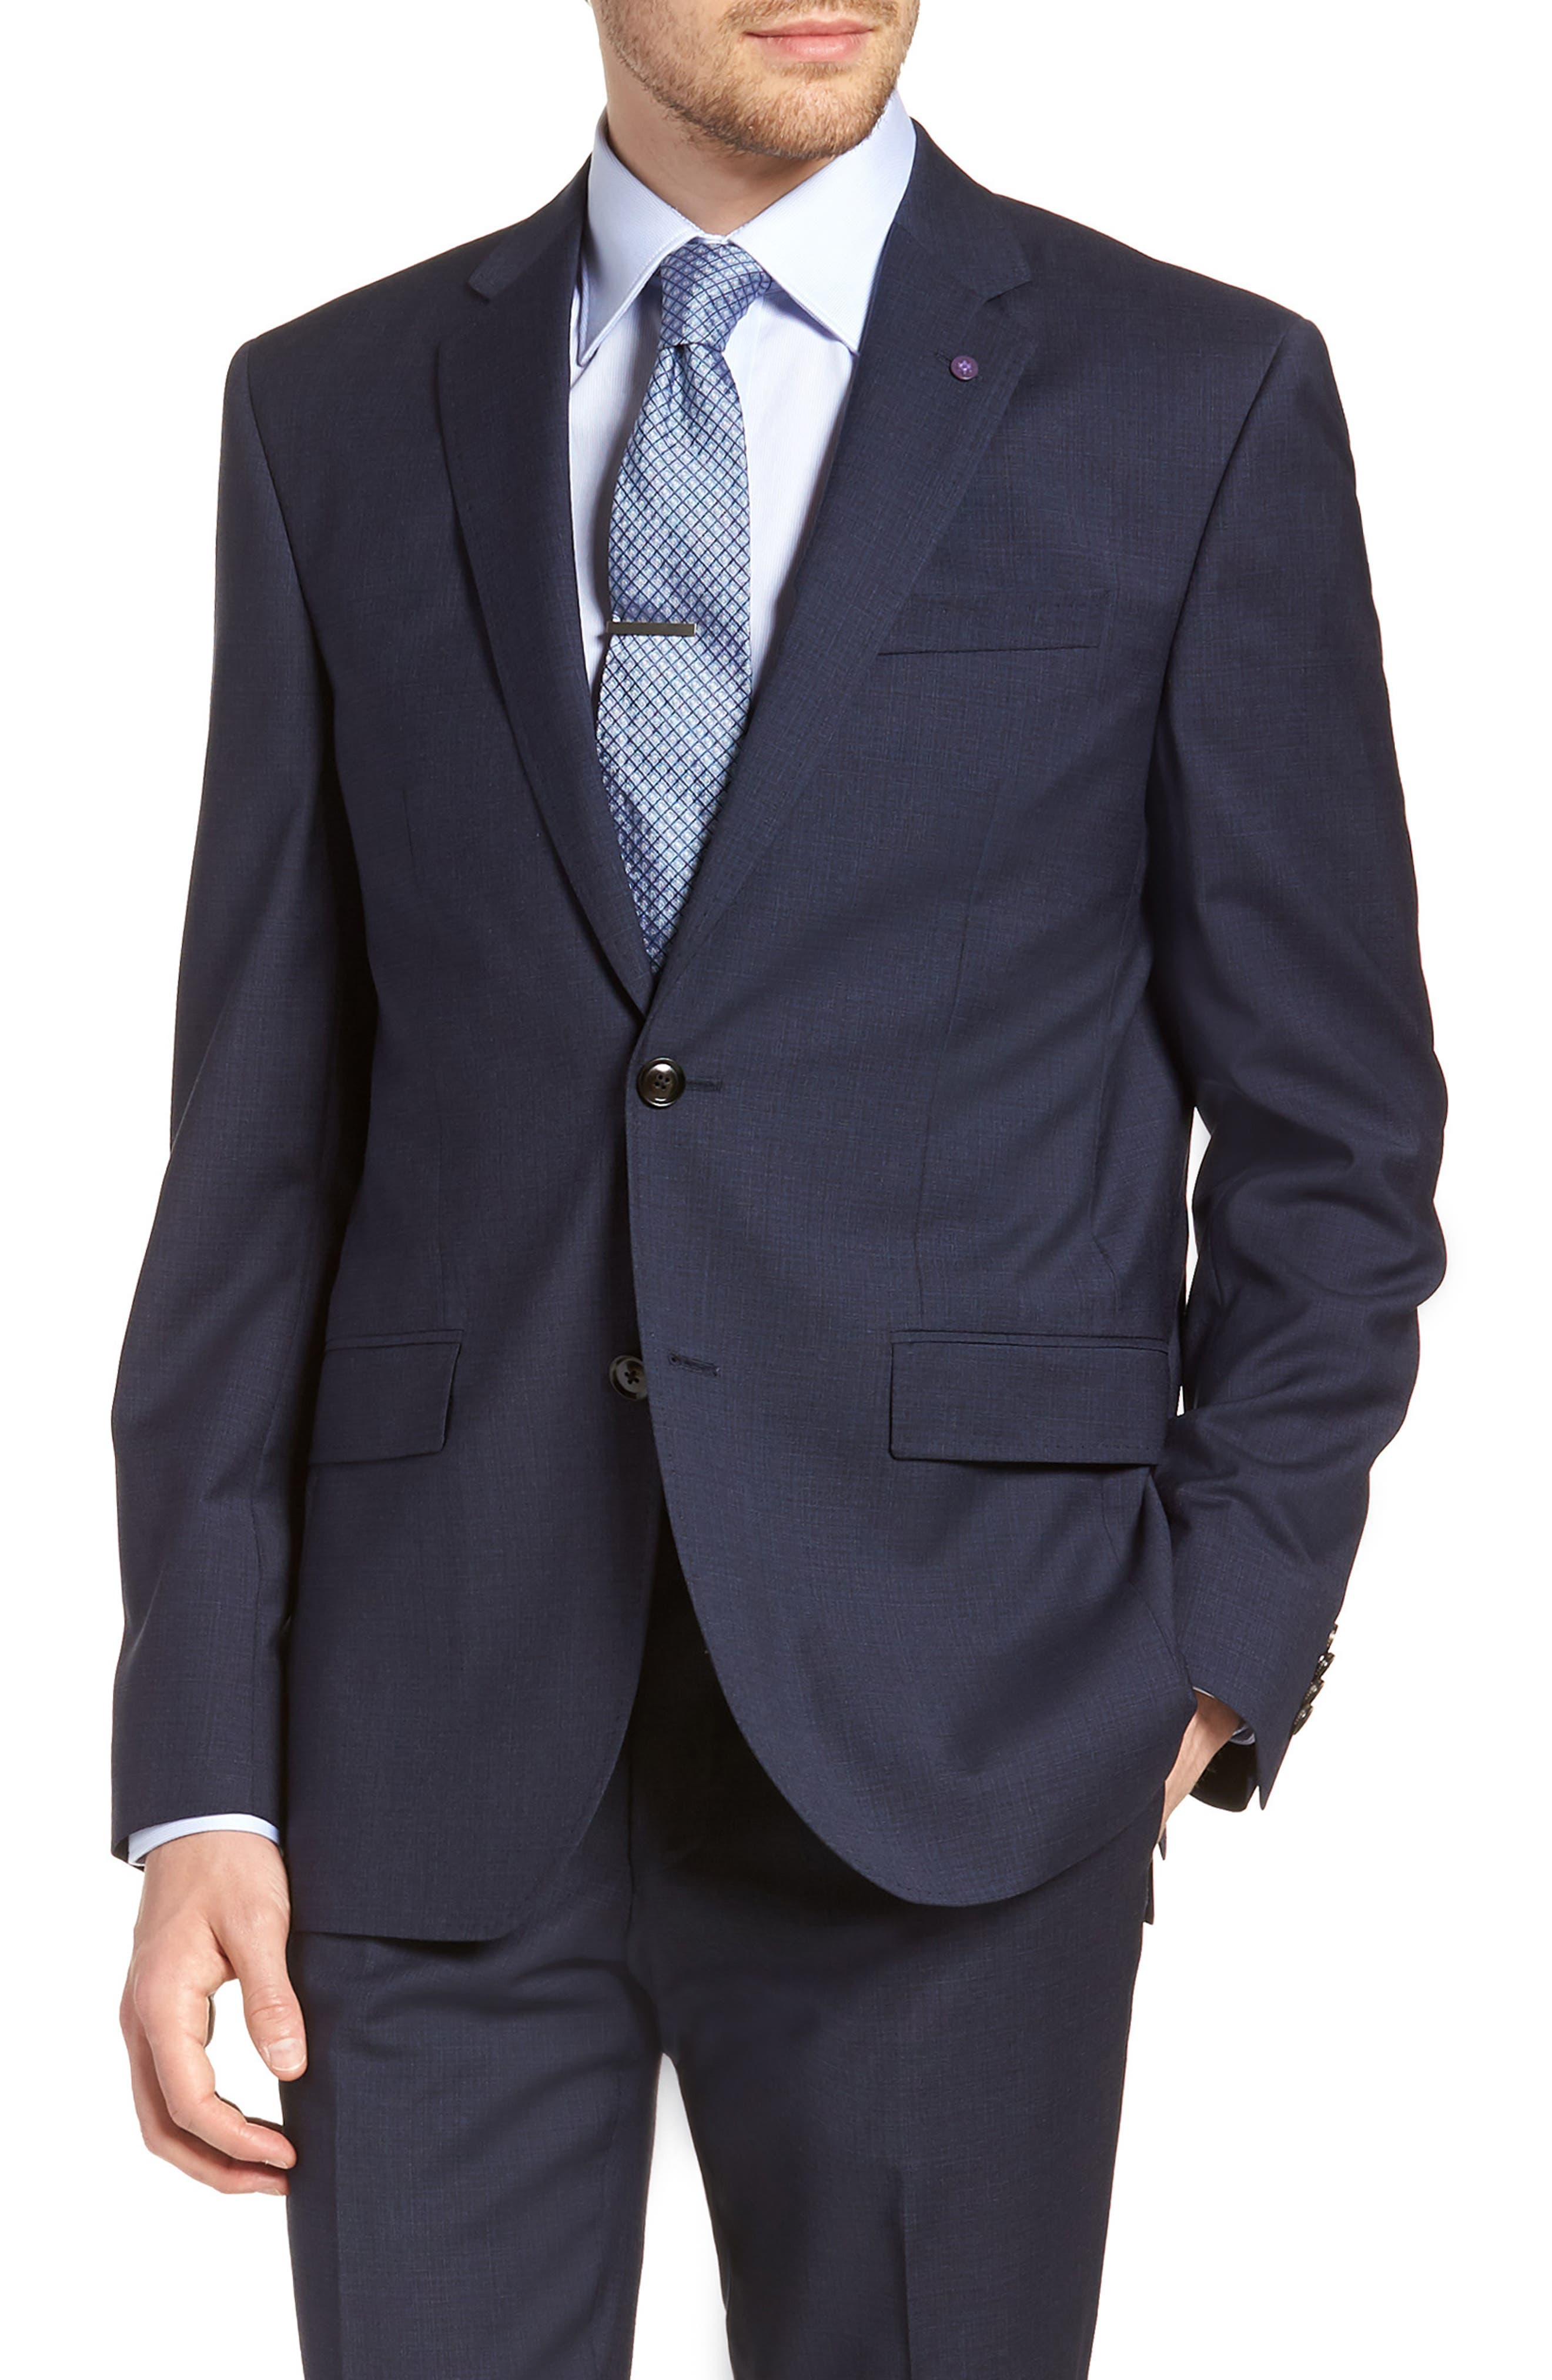 Jay Trim Fit Solid Wool Suit,                             Alternate thumbnail 5, color,                             BLUE